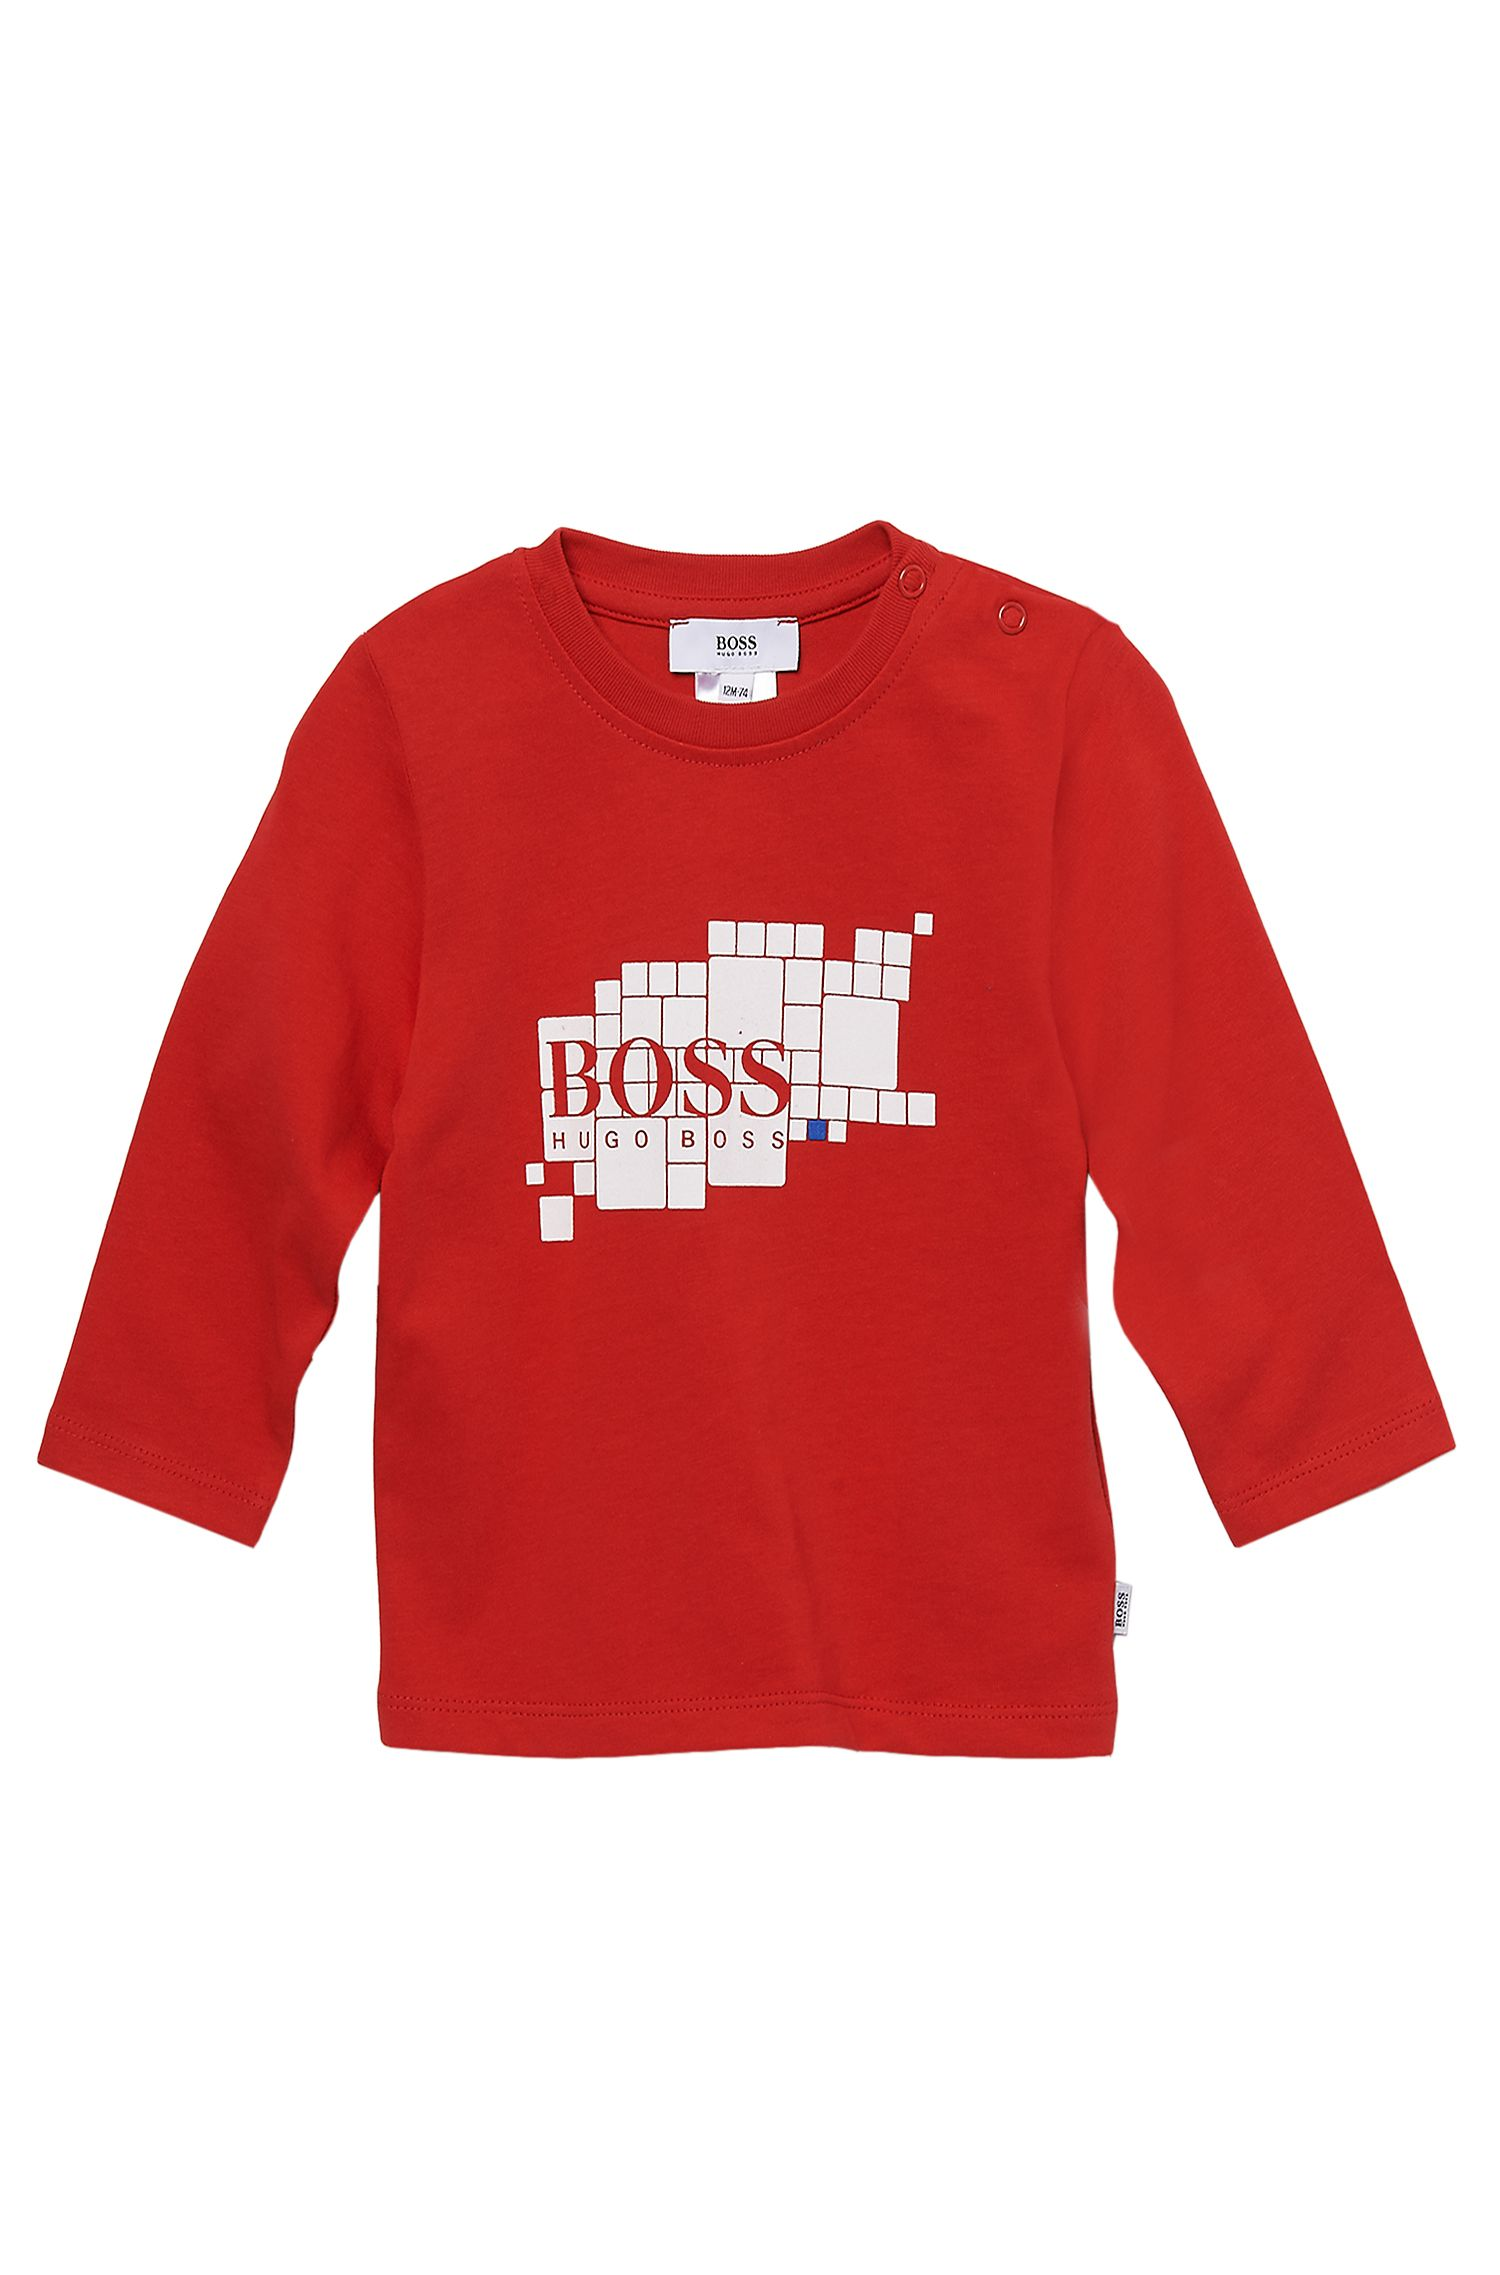 'J05249'   Toddler Long-Sleeved Cotton Print Crewneck T-Shirt